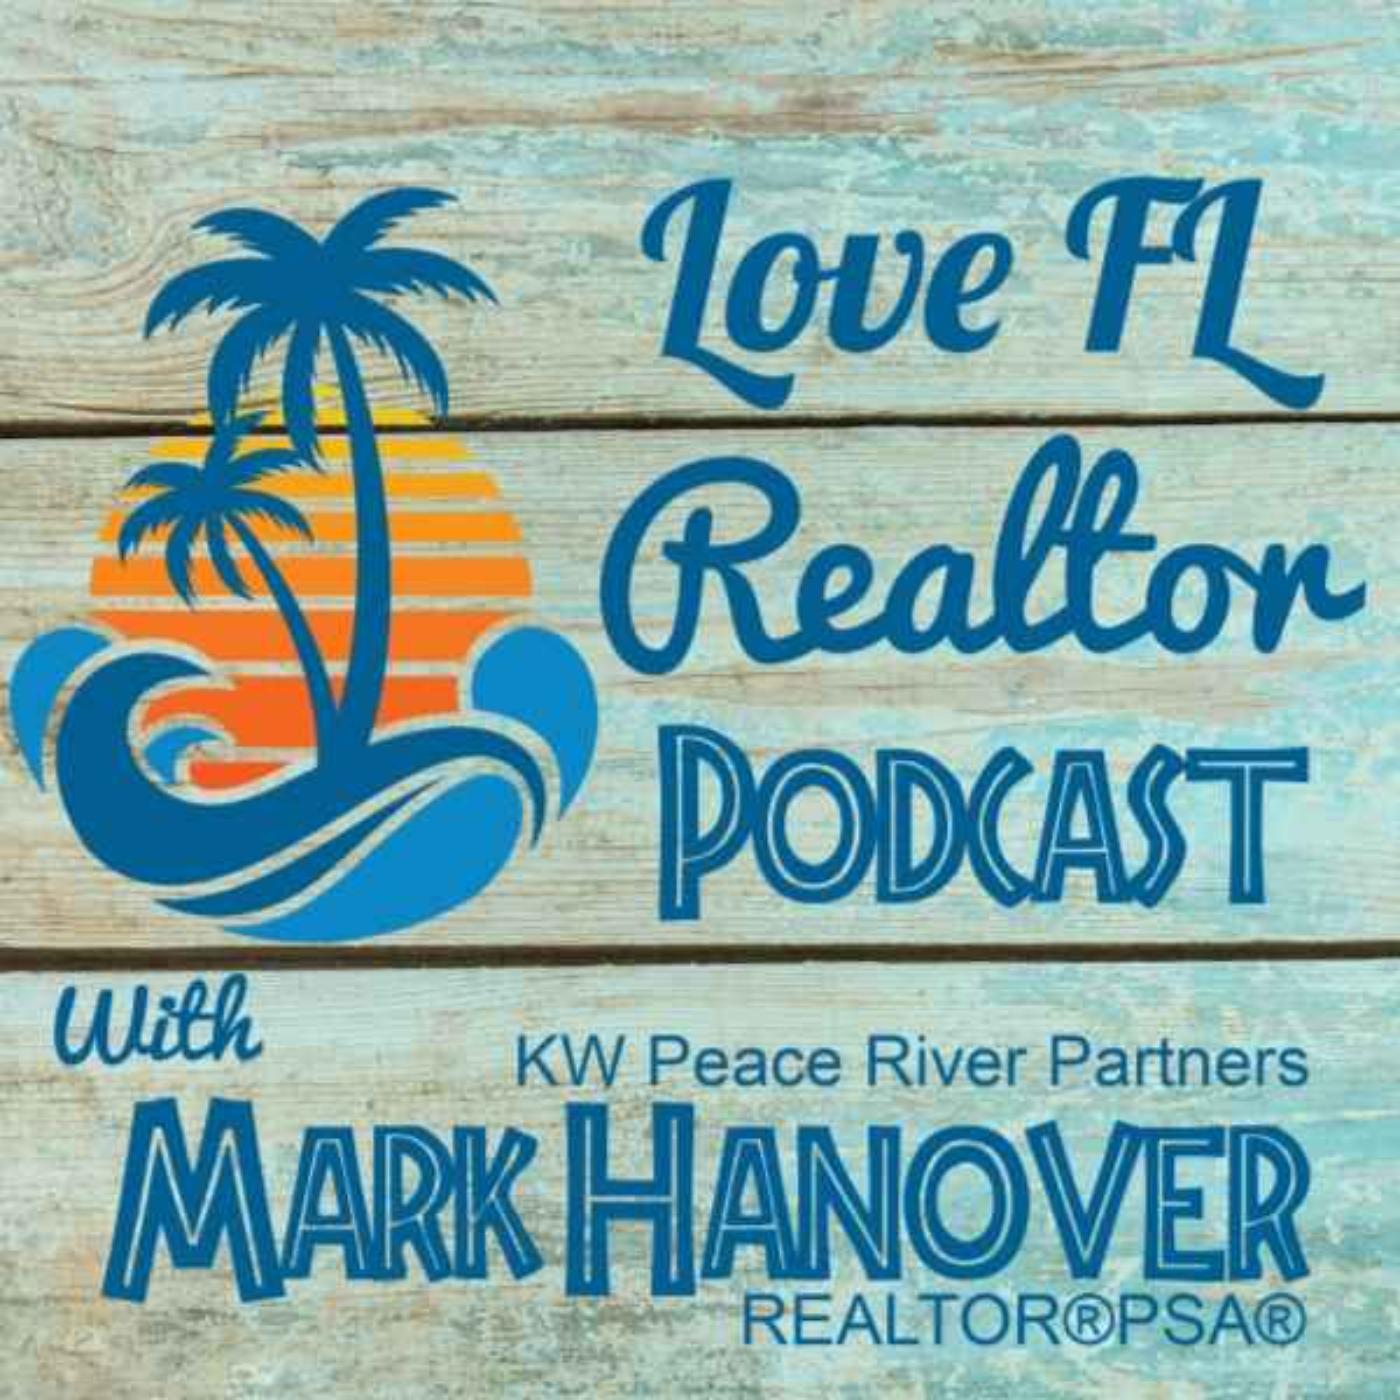 Love FL Realtor Podcast hosted by Mark Hanover